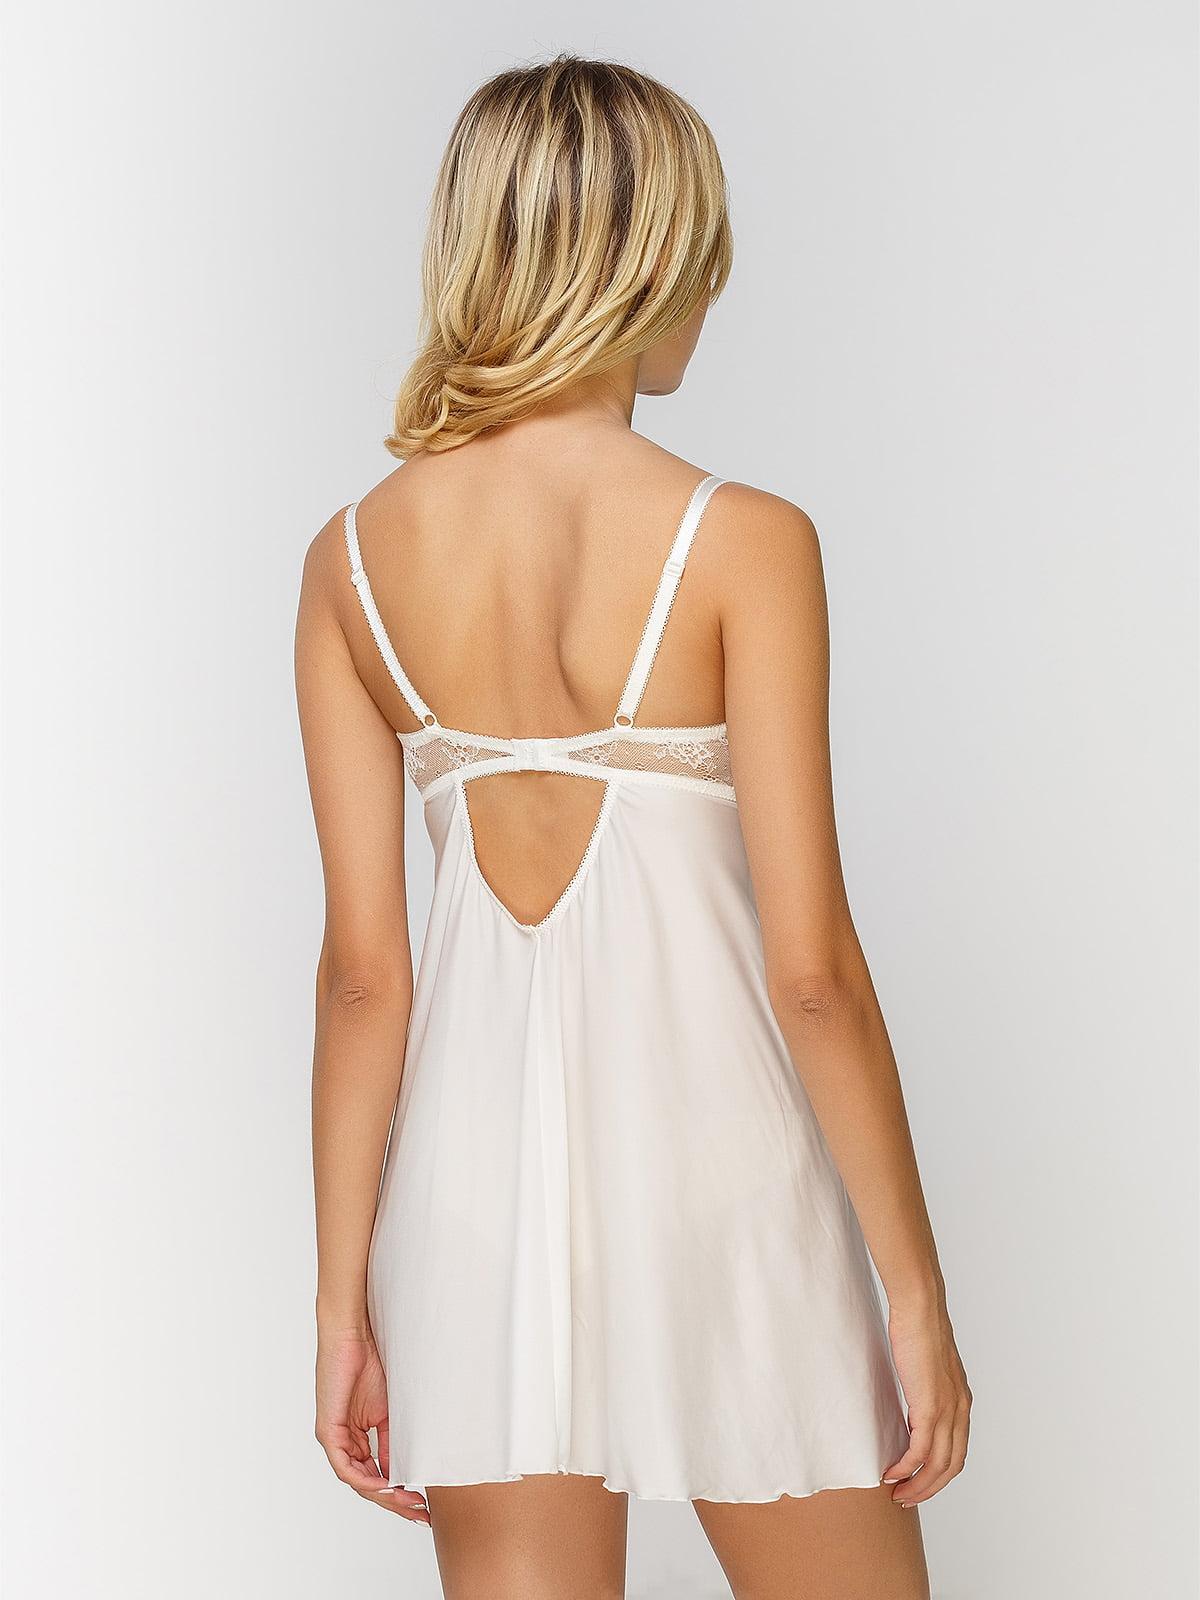 Рубашка ночная молочного цвета | 4610124 | фото 2